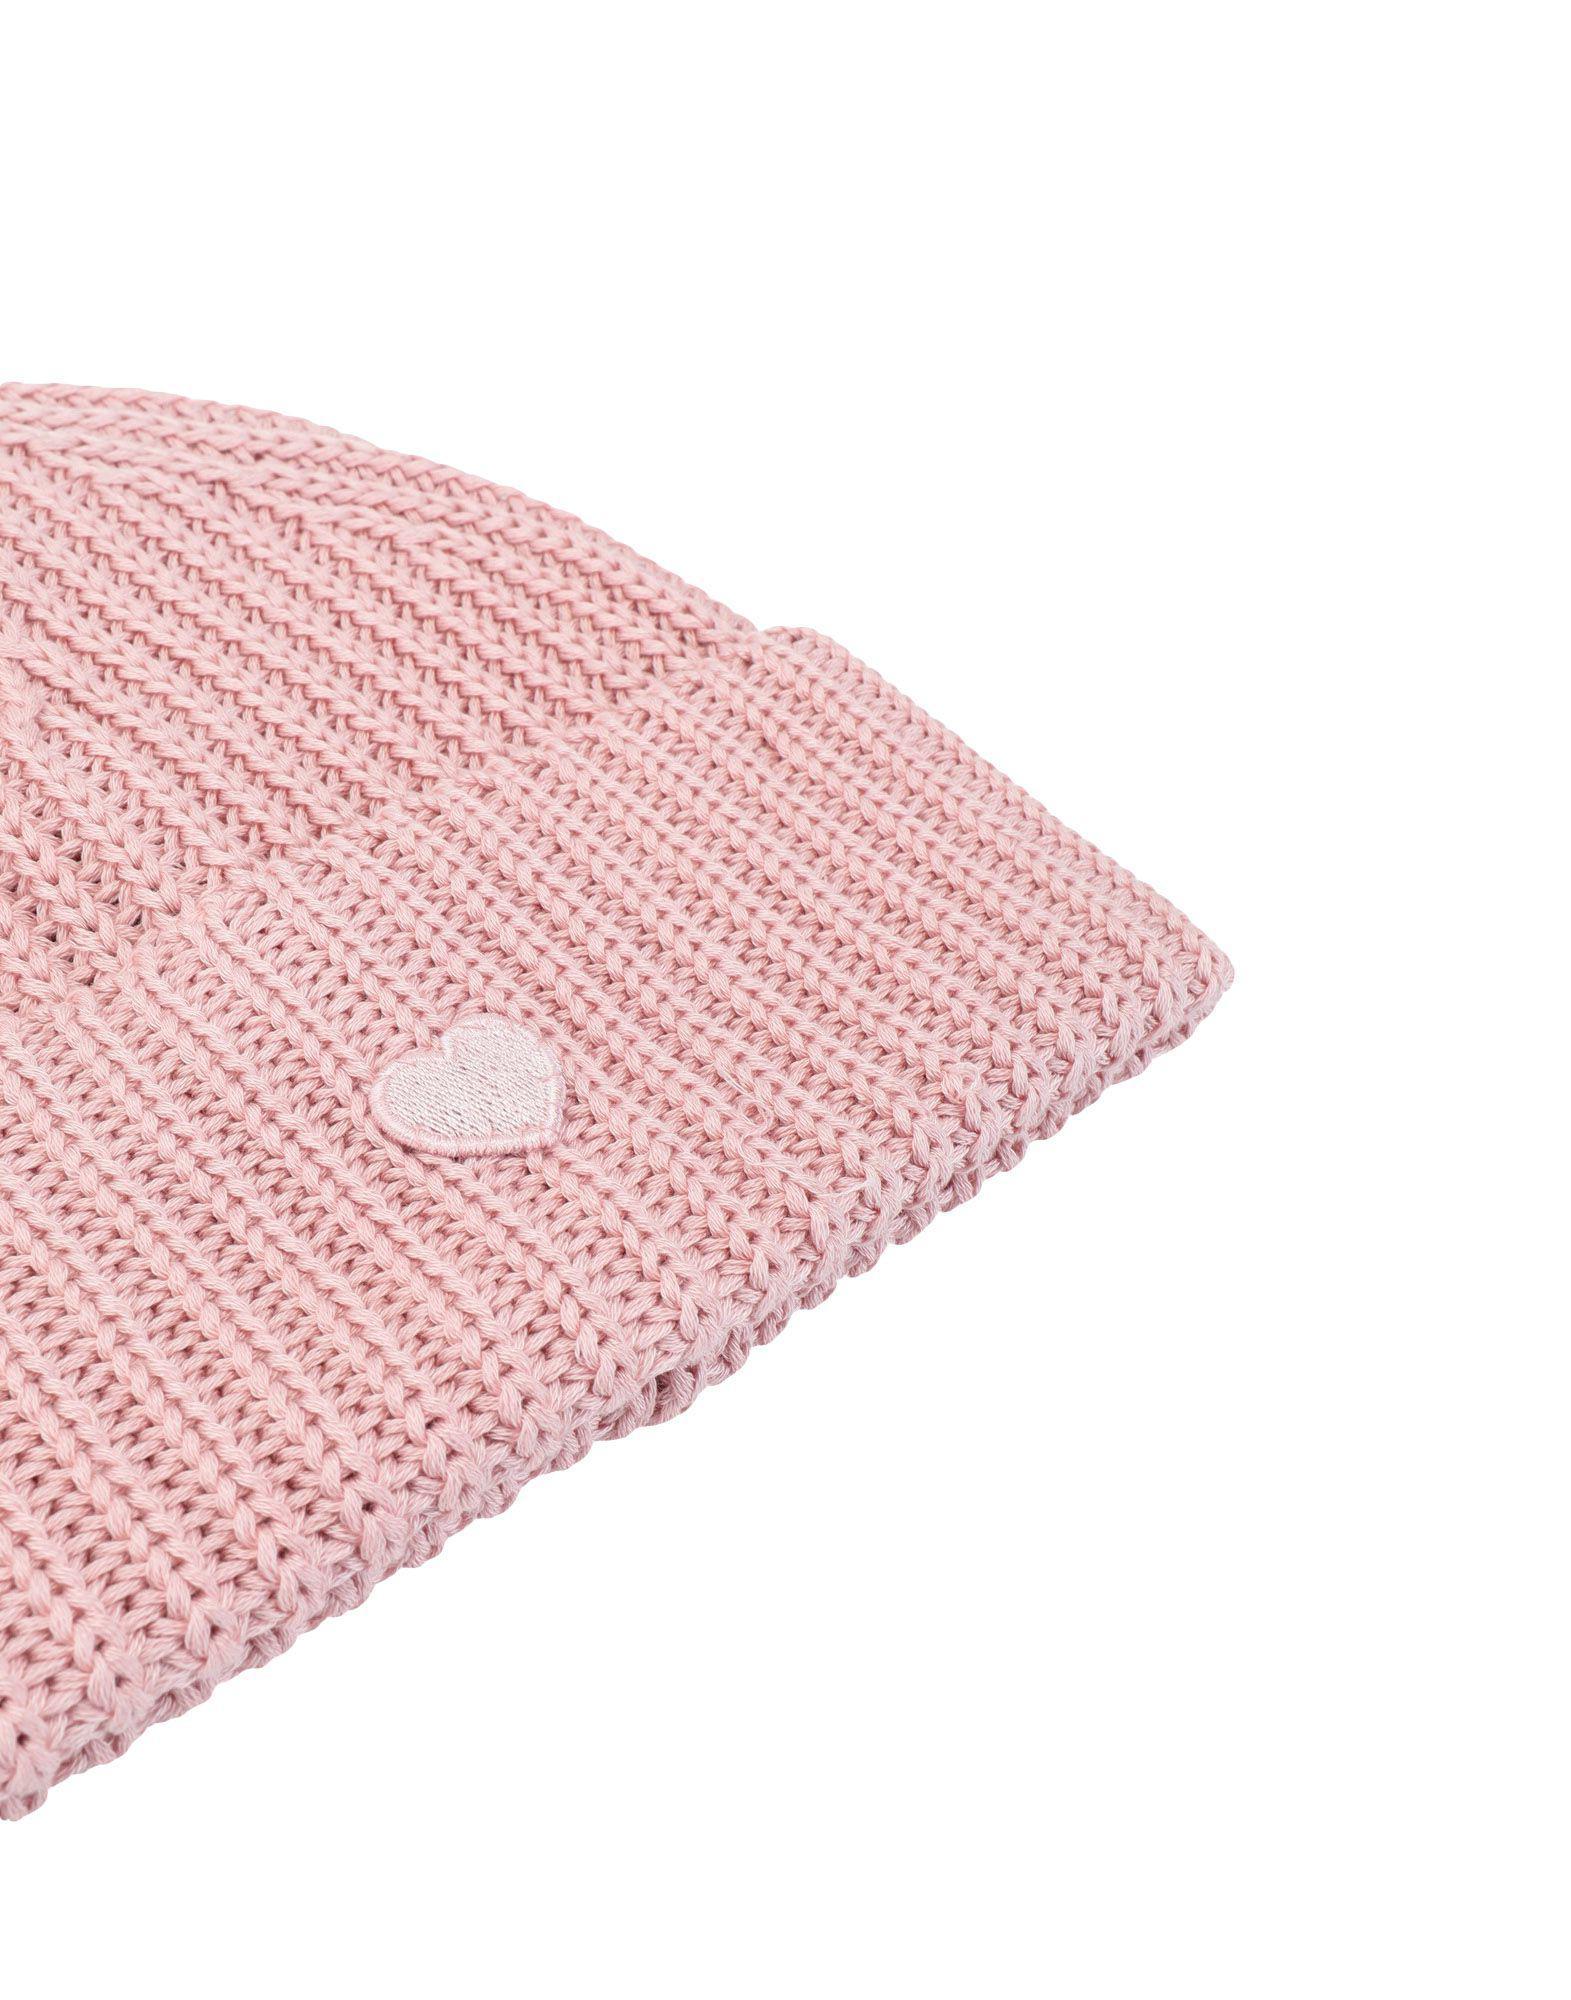 Federica Moretti Hat in Pink - Lyst 02d355cd32f1